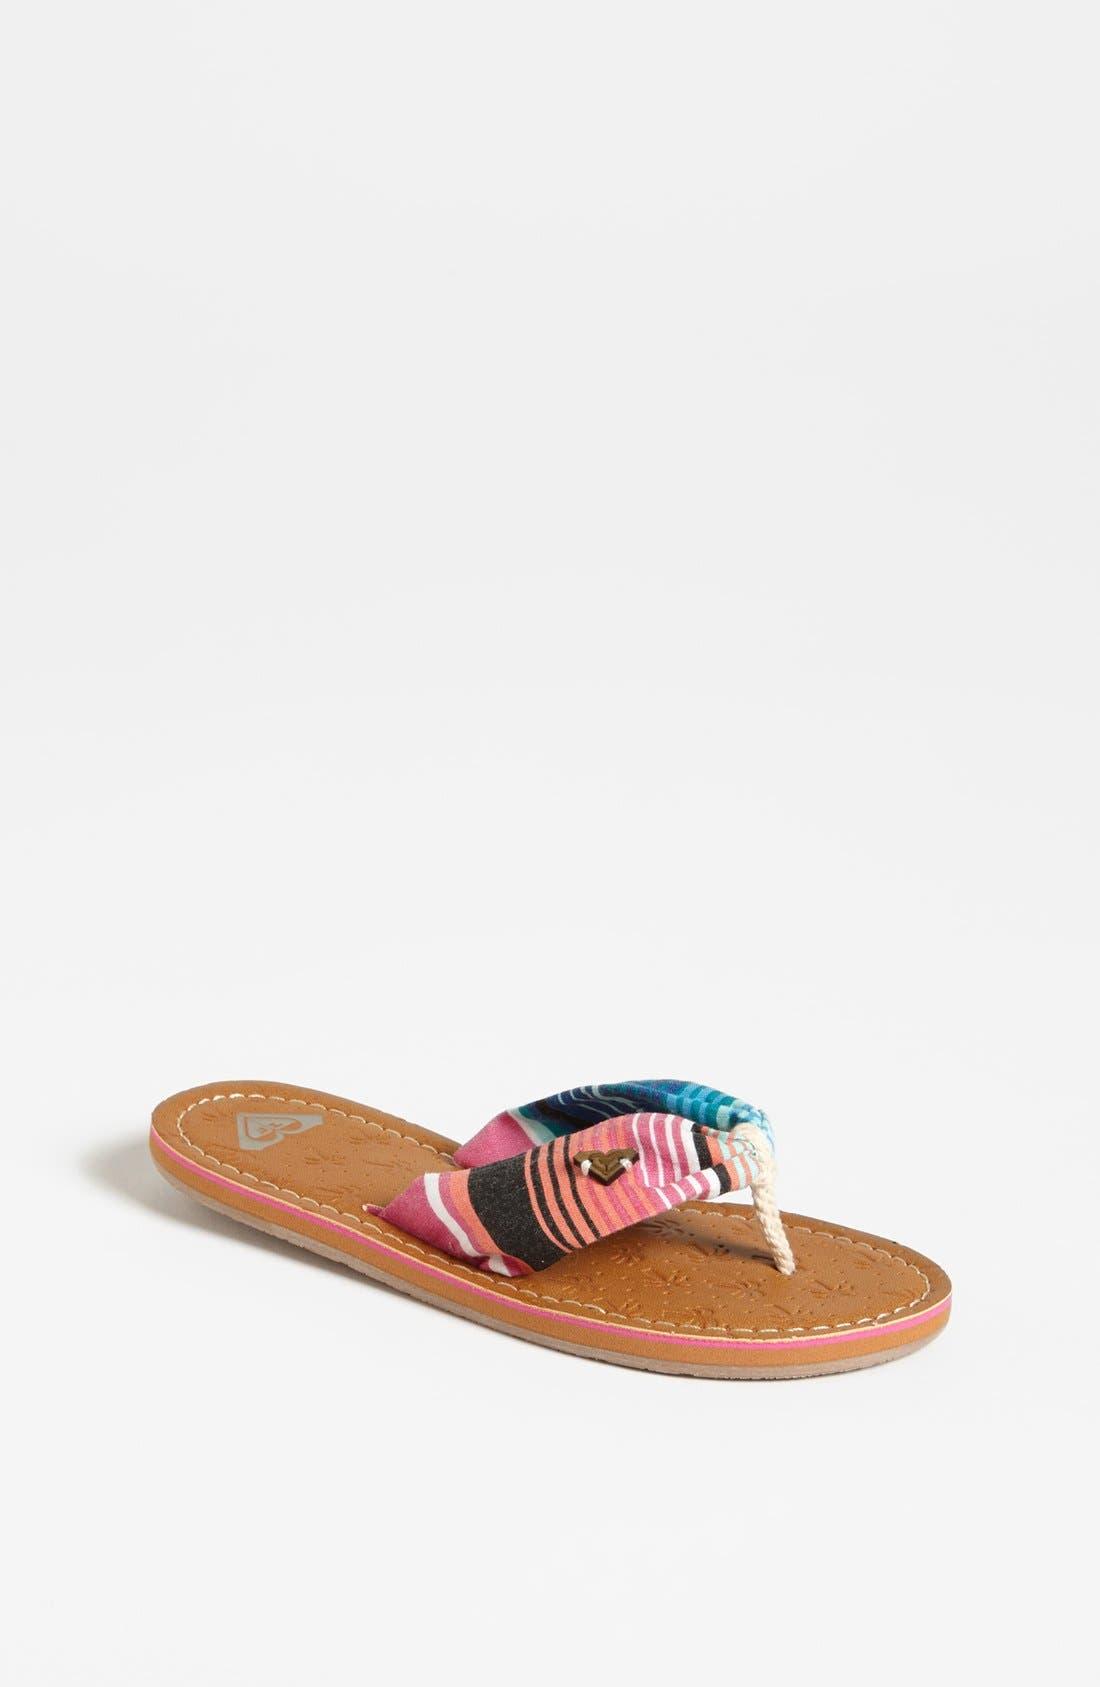 Alternate Image 1 Selected - Roxy Stripe Sandal (Toddler, Little Kid & Big Kid)